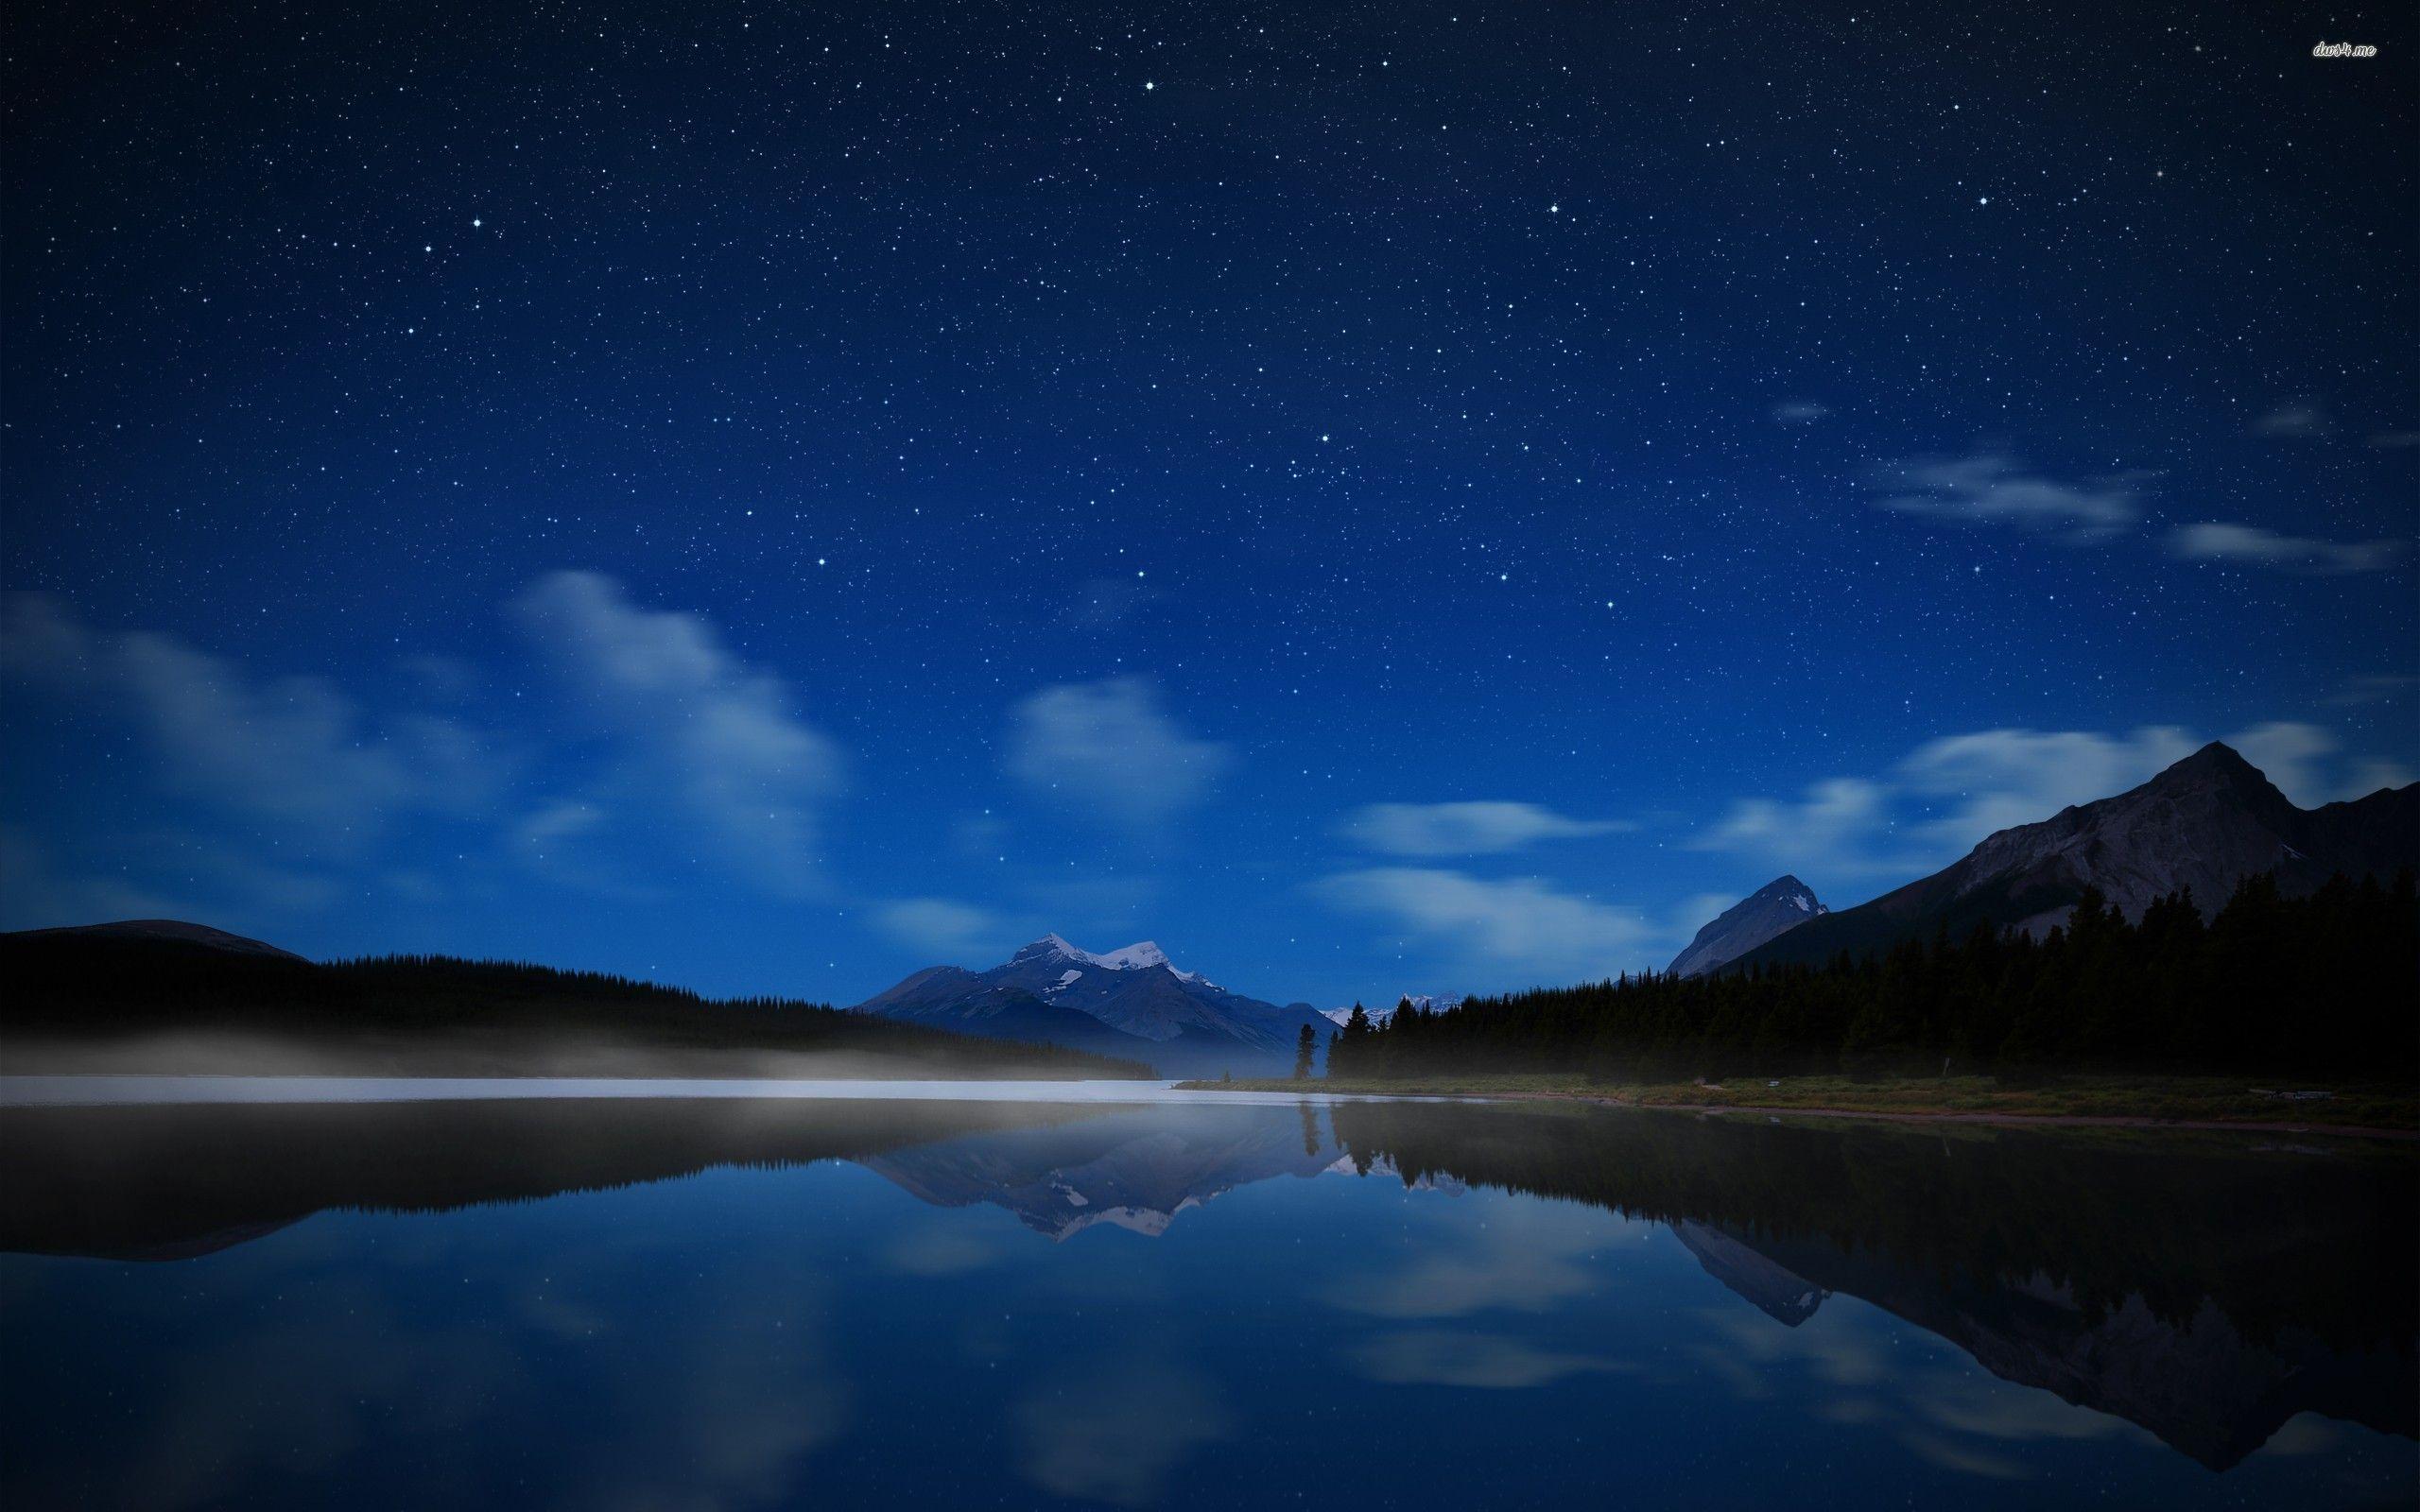 Night Sky Stars Wallpapers 2560x1600